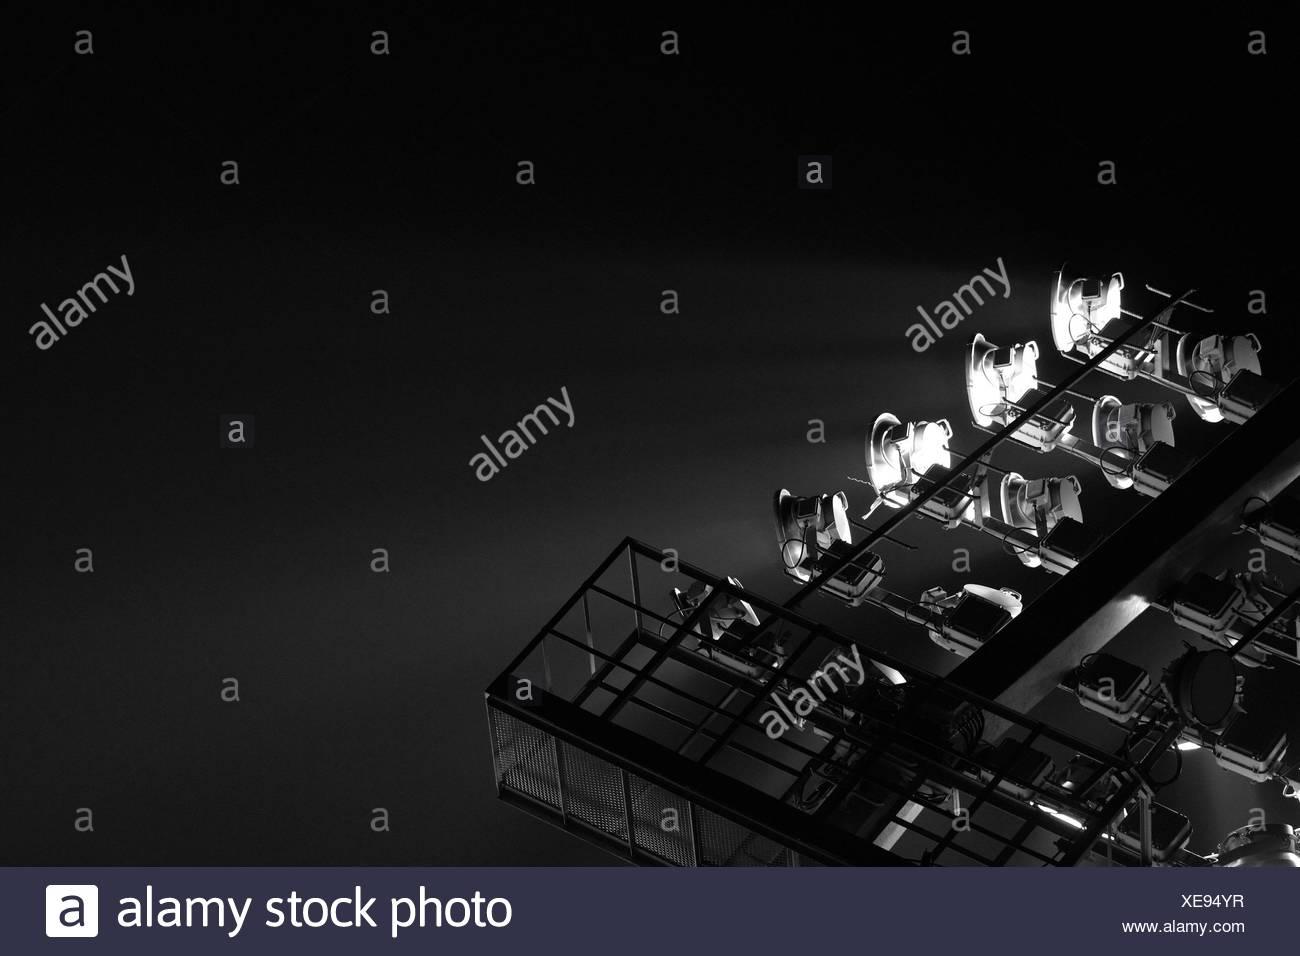 The Stadium Spot-light tower (dark background) - Stock Image